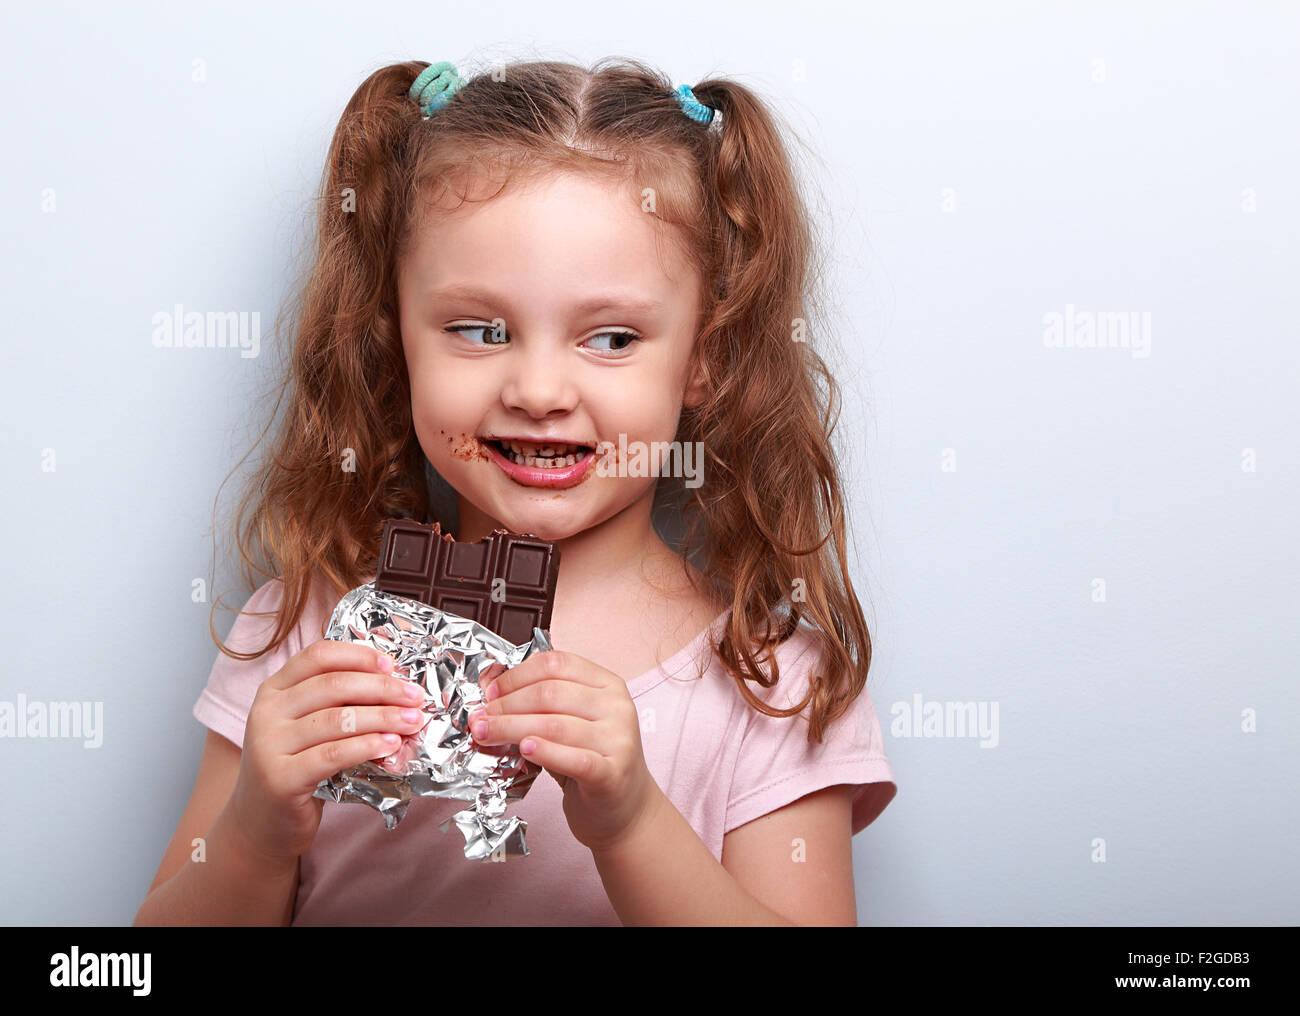 curious cute kid girl eating dark chocolate and looking fun. closeup